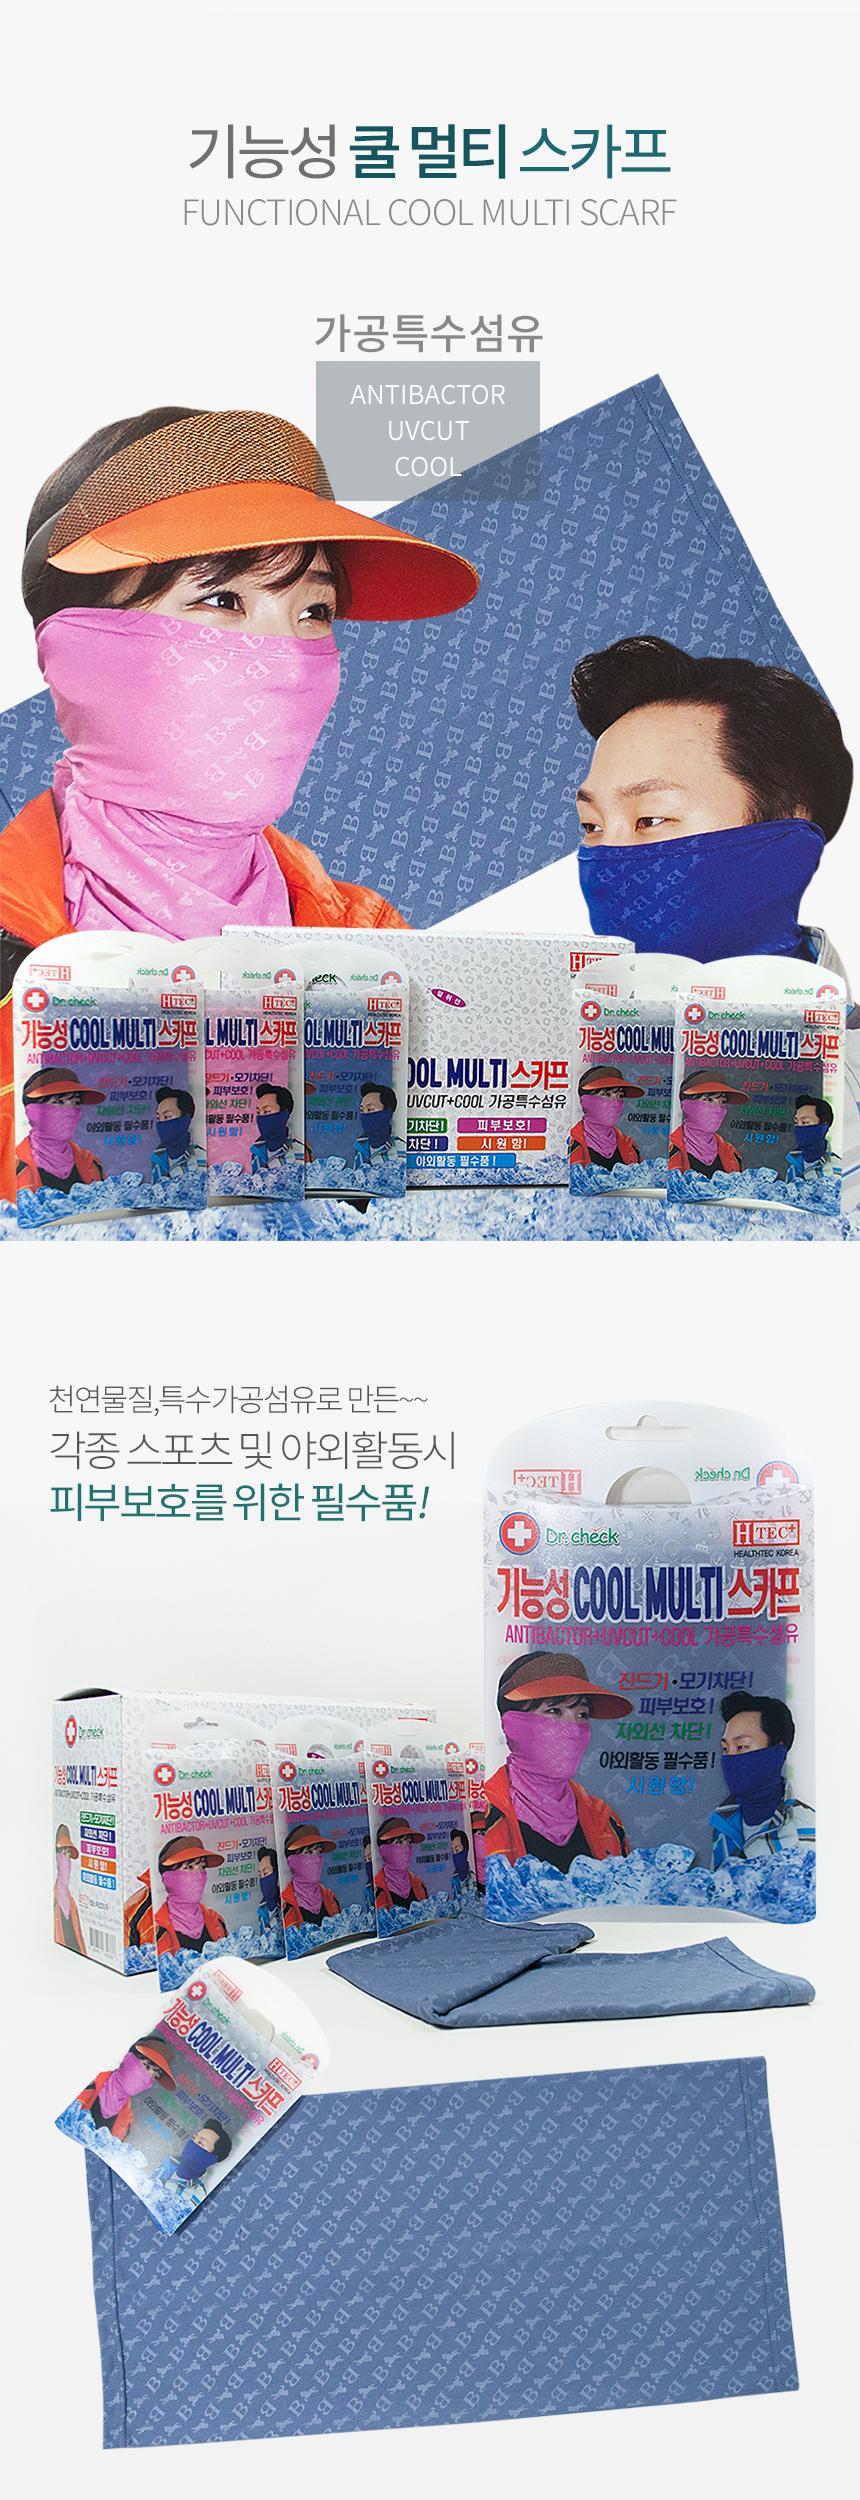 cool_multi_scarf_1.jpg